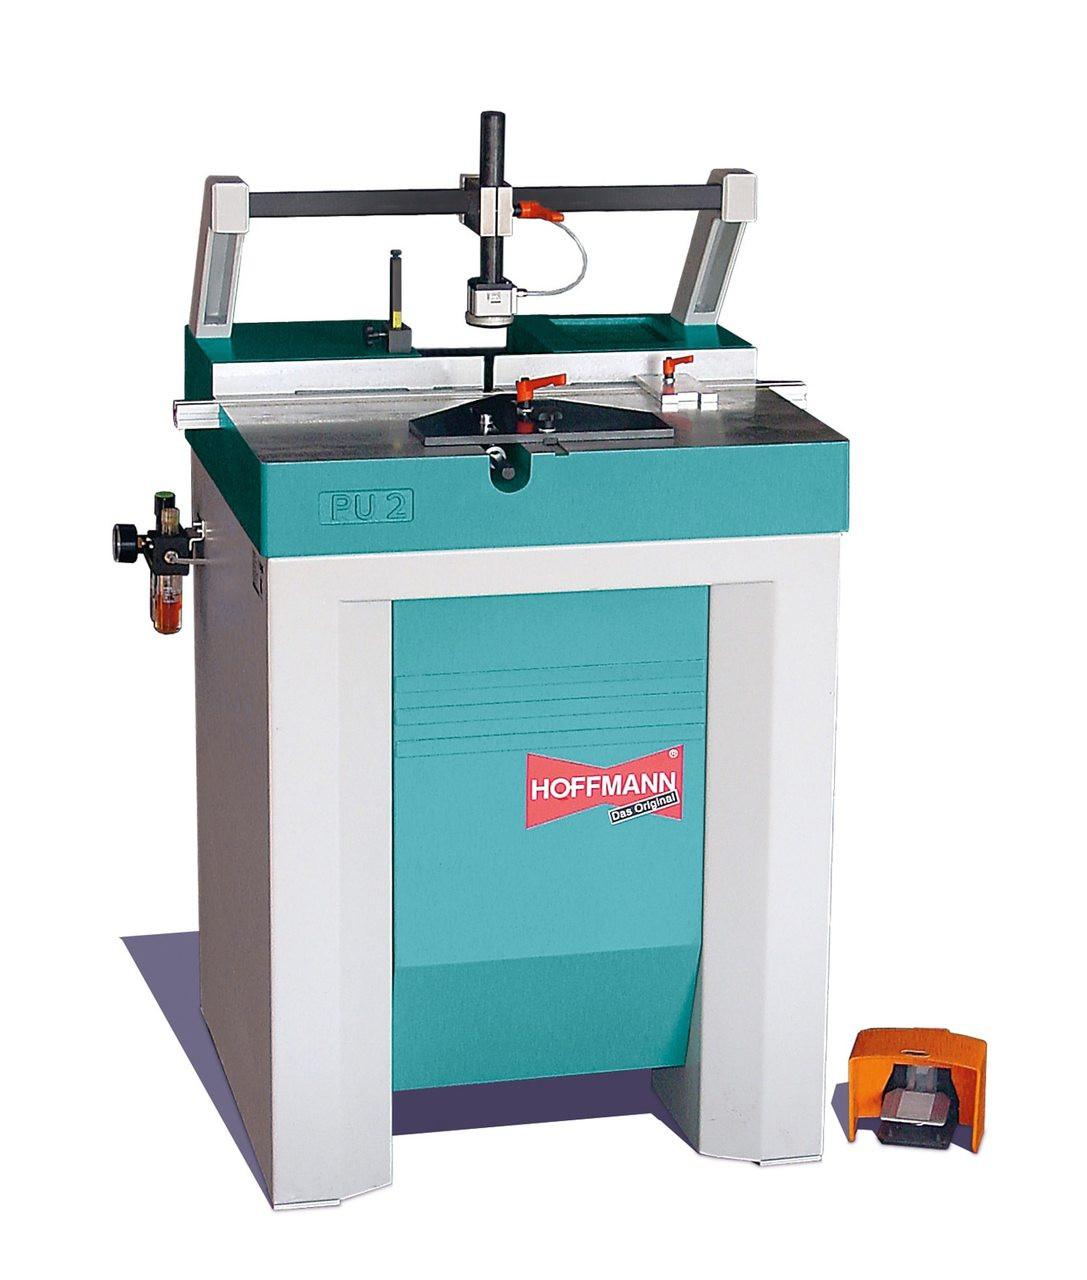 Hoffmann PU2 Pneumatic Dovetail Routing Machine